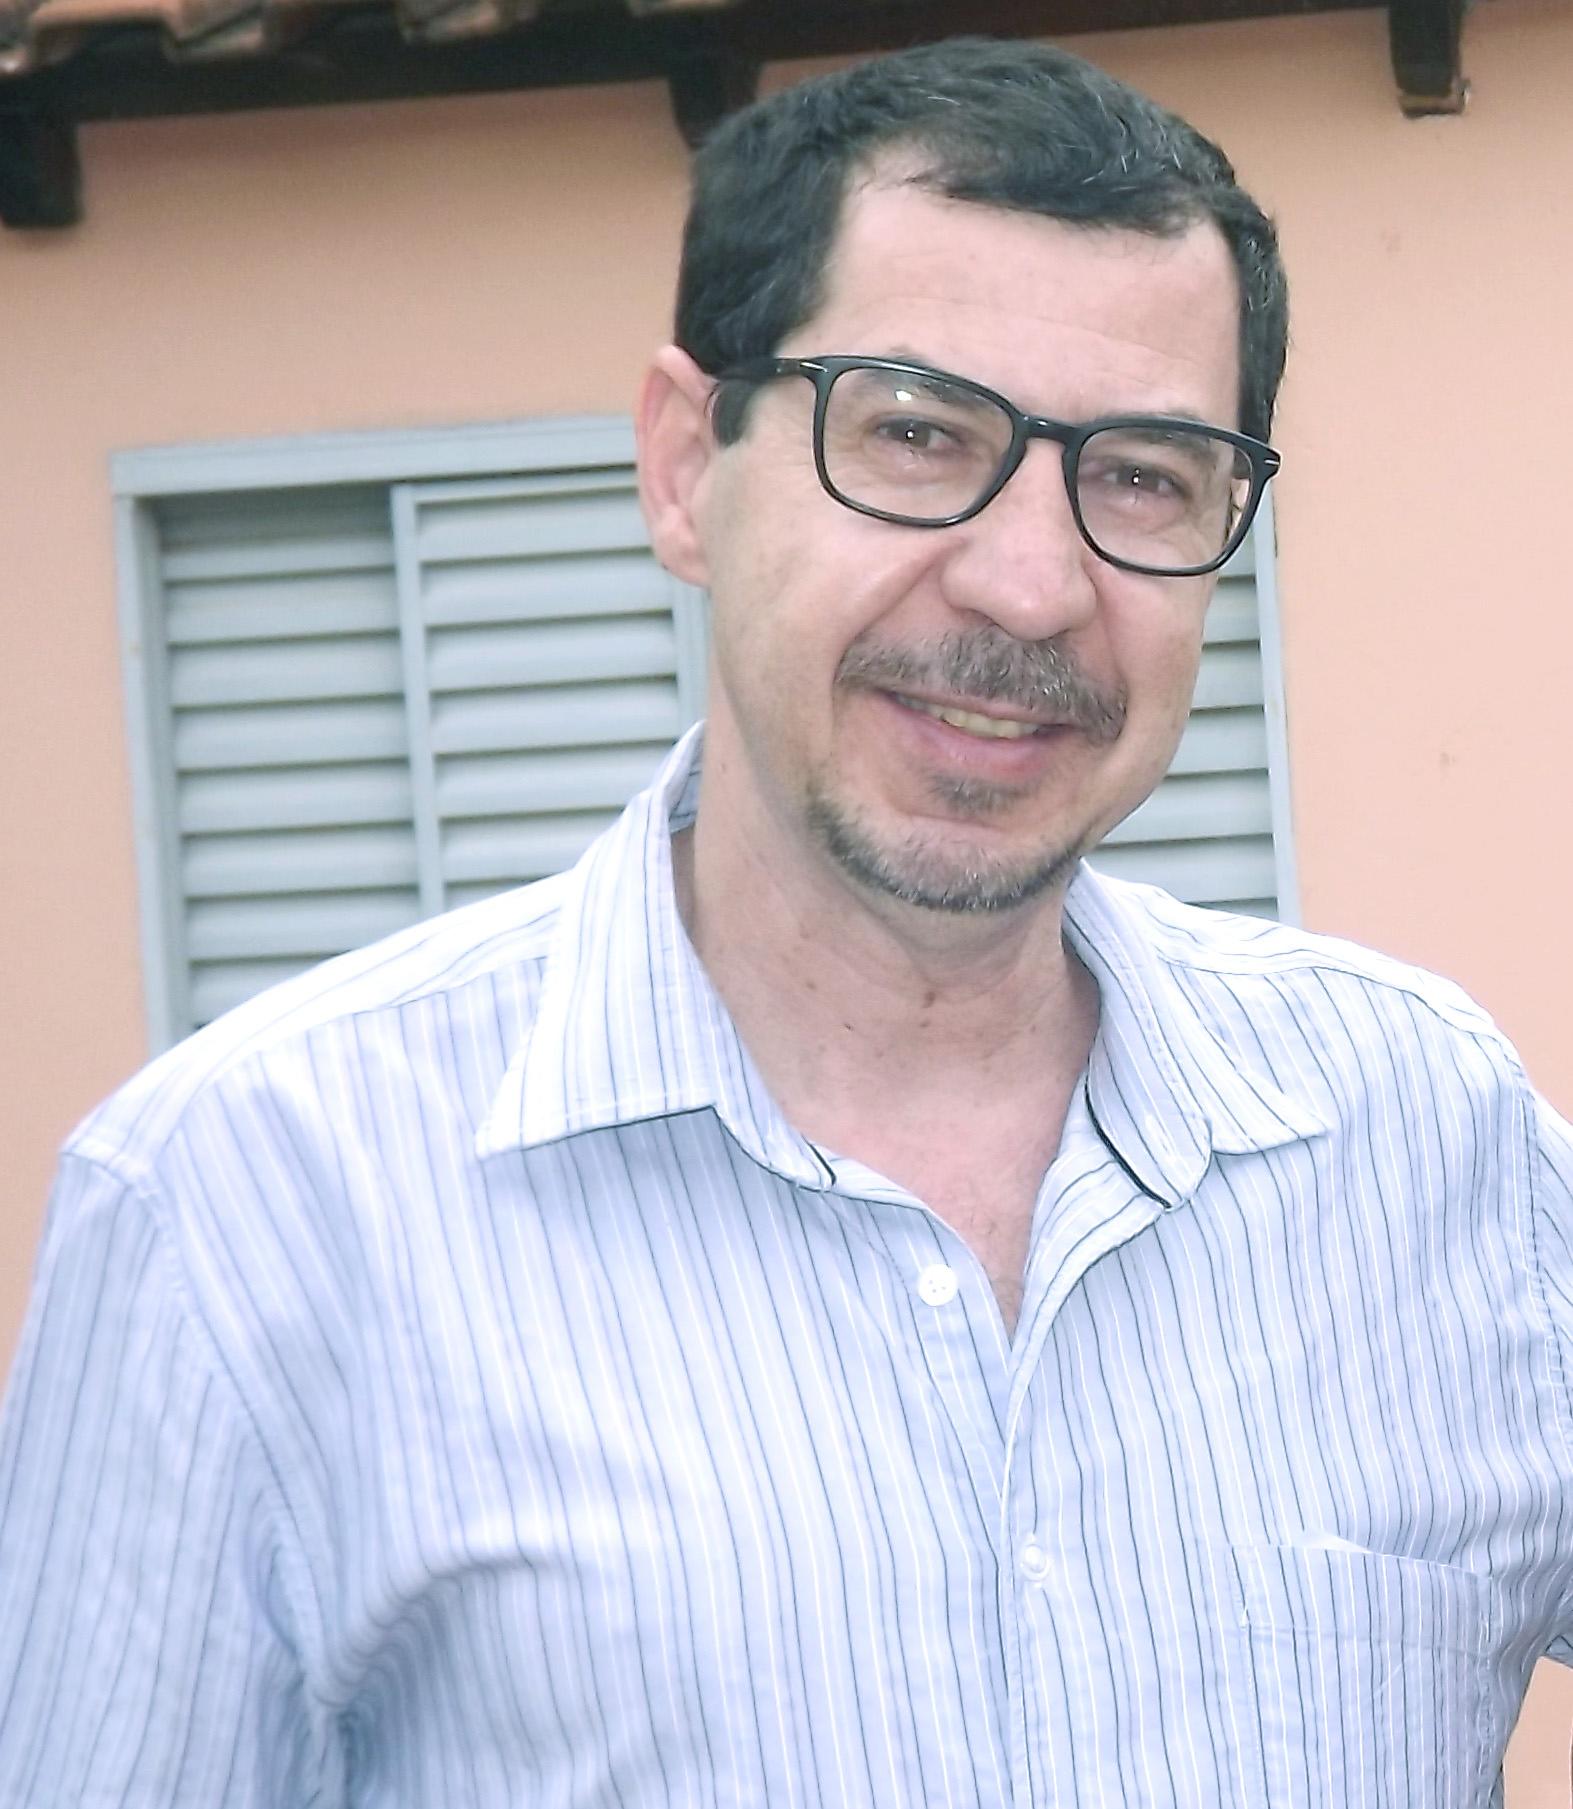 Luiz Domingues